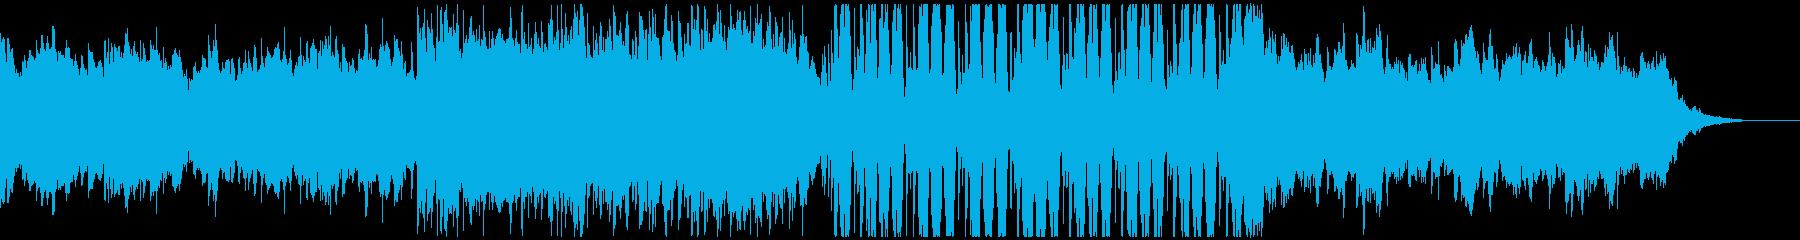 FuturePop3、お洒落、洋楽、夏Hの再生済みの波形